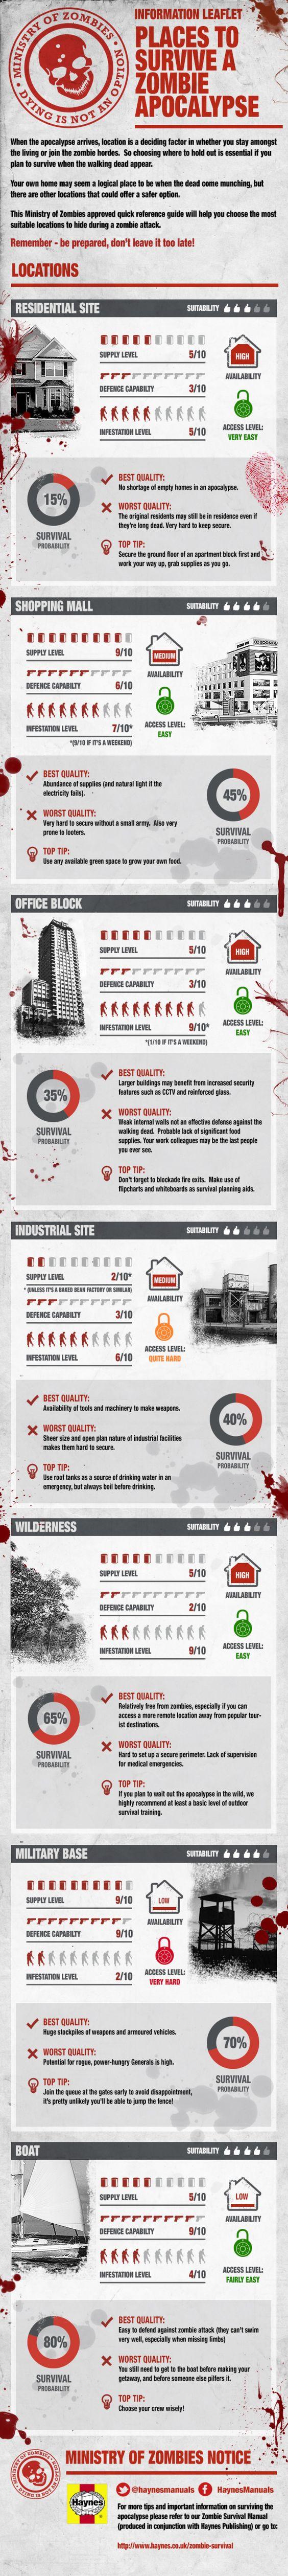 Places To Survive A Zombie Apocalypse #Infographic #Zombie